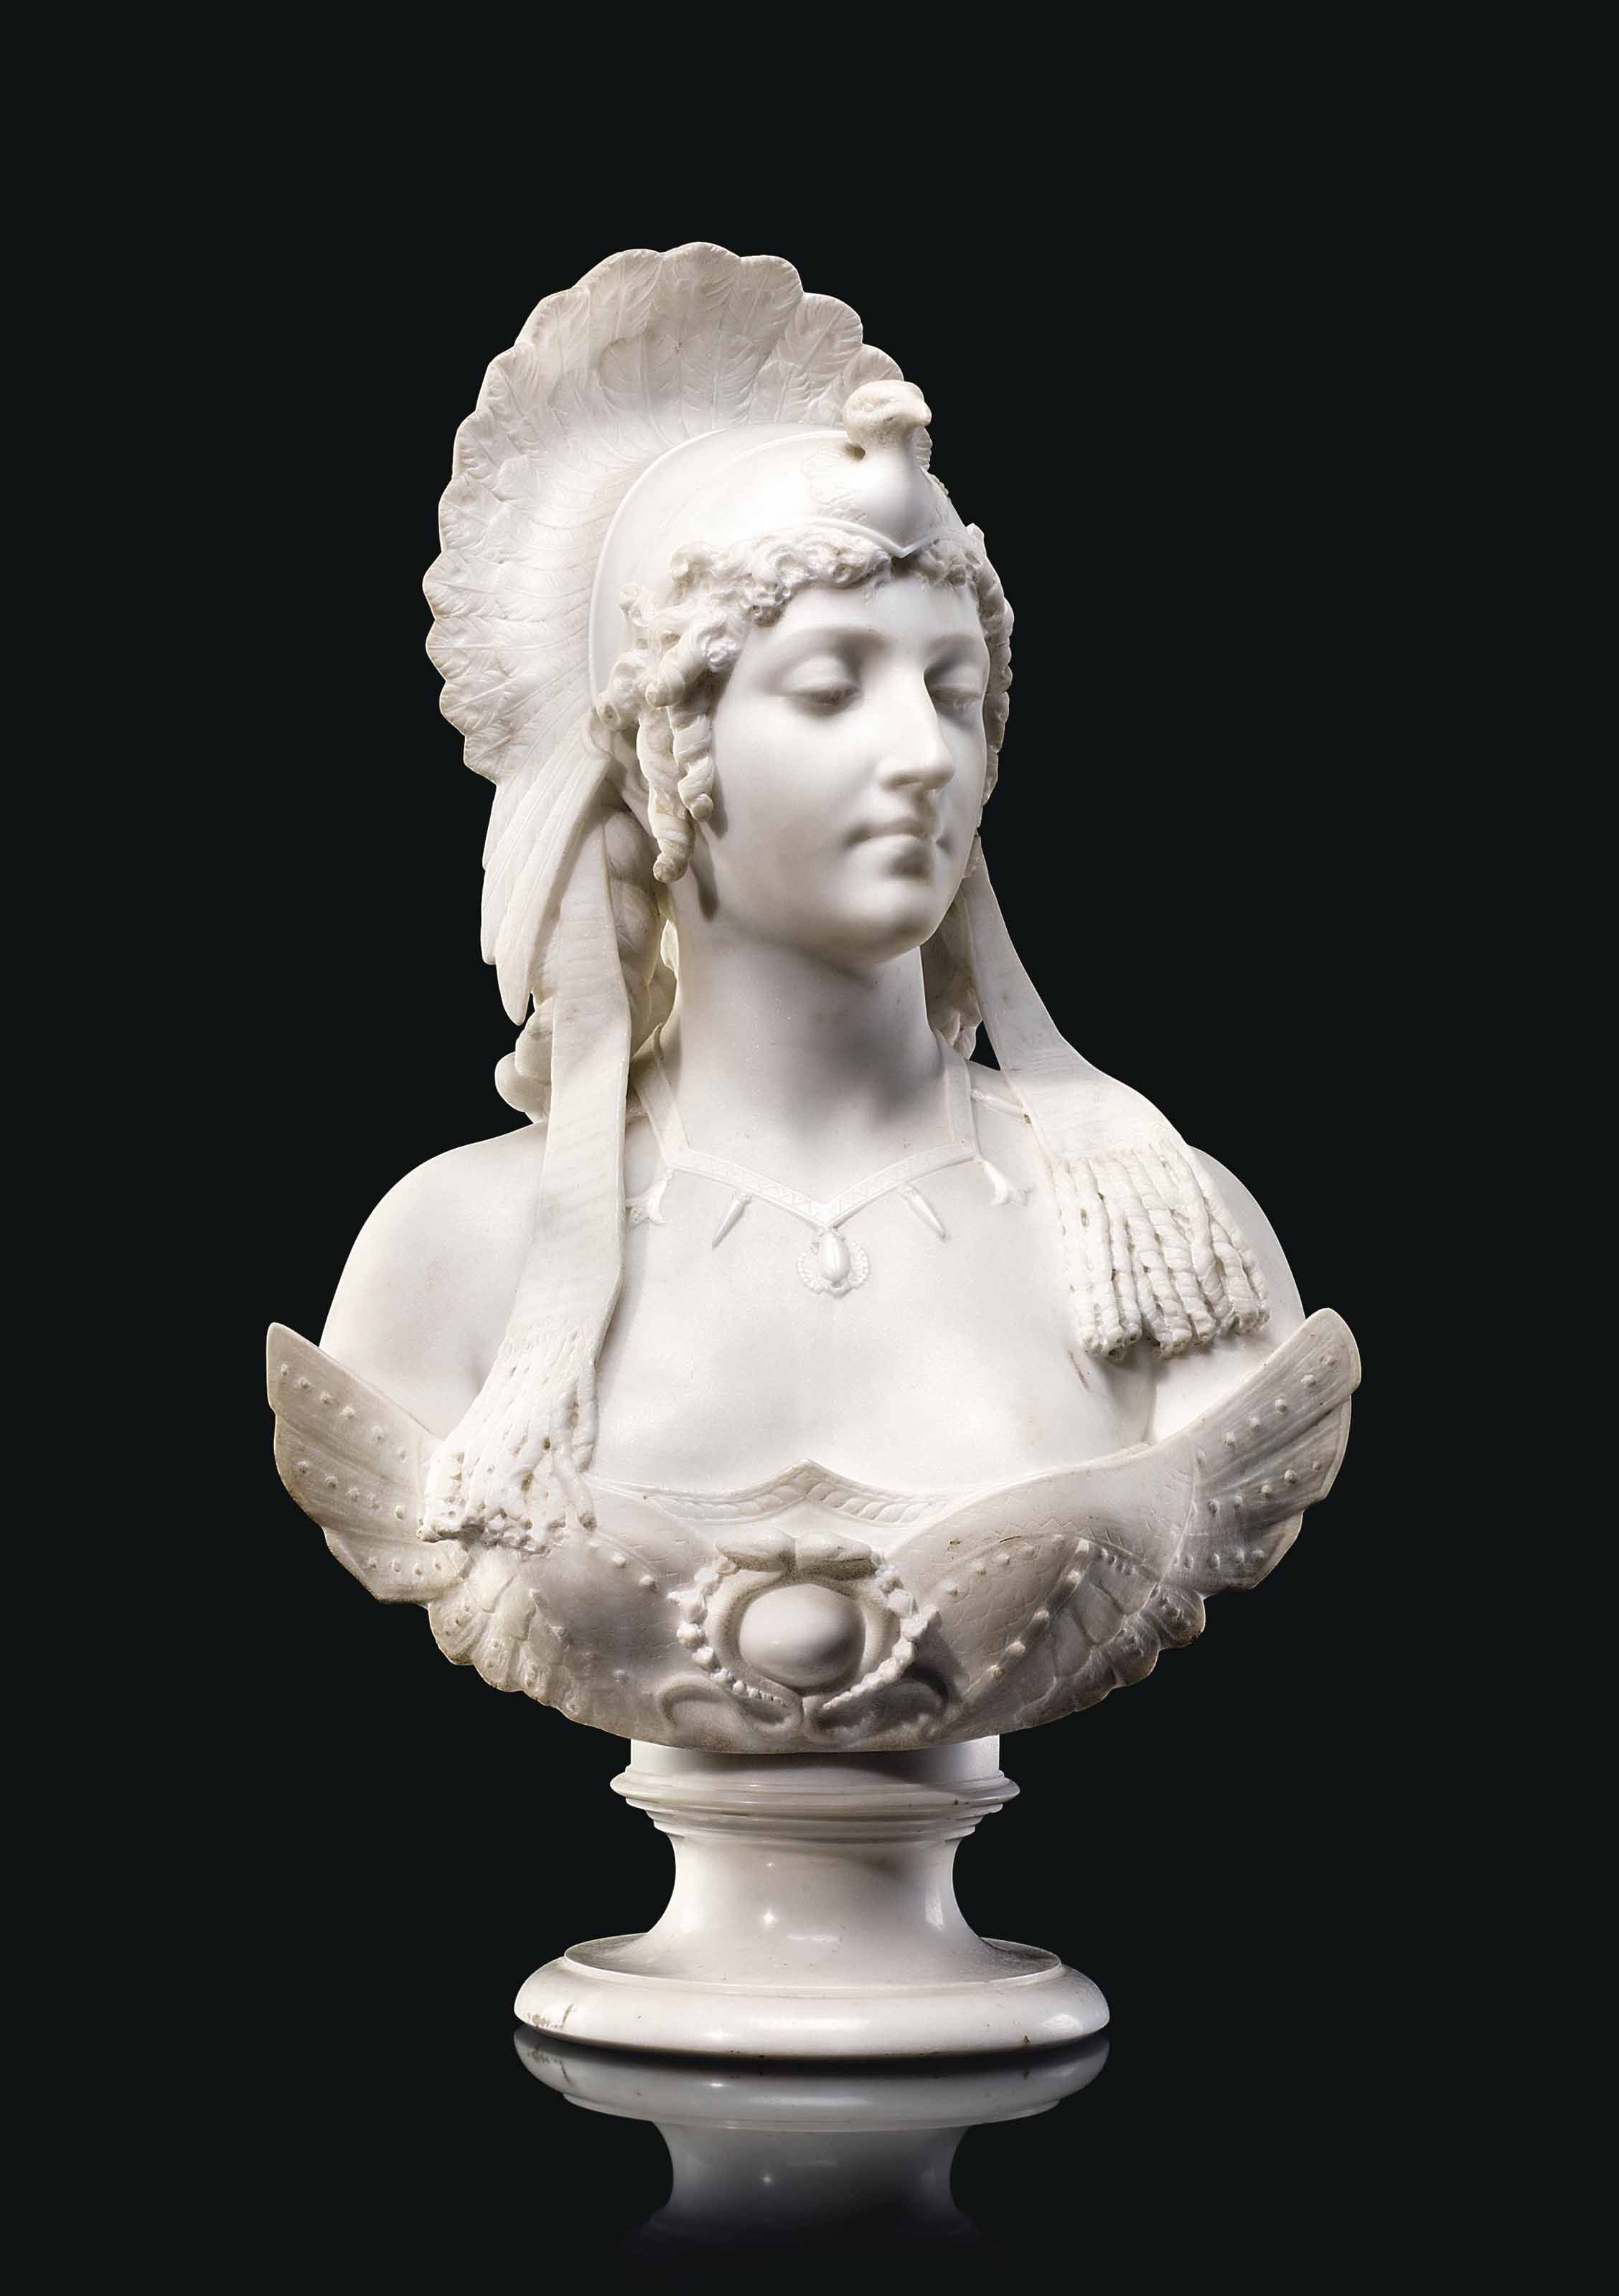 An Italian Marble Bust Of Cleopatra Circa 1900 Bust Marble Christie S Marble Bust Italian Marble Bust